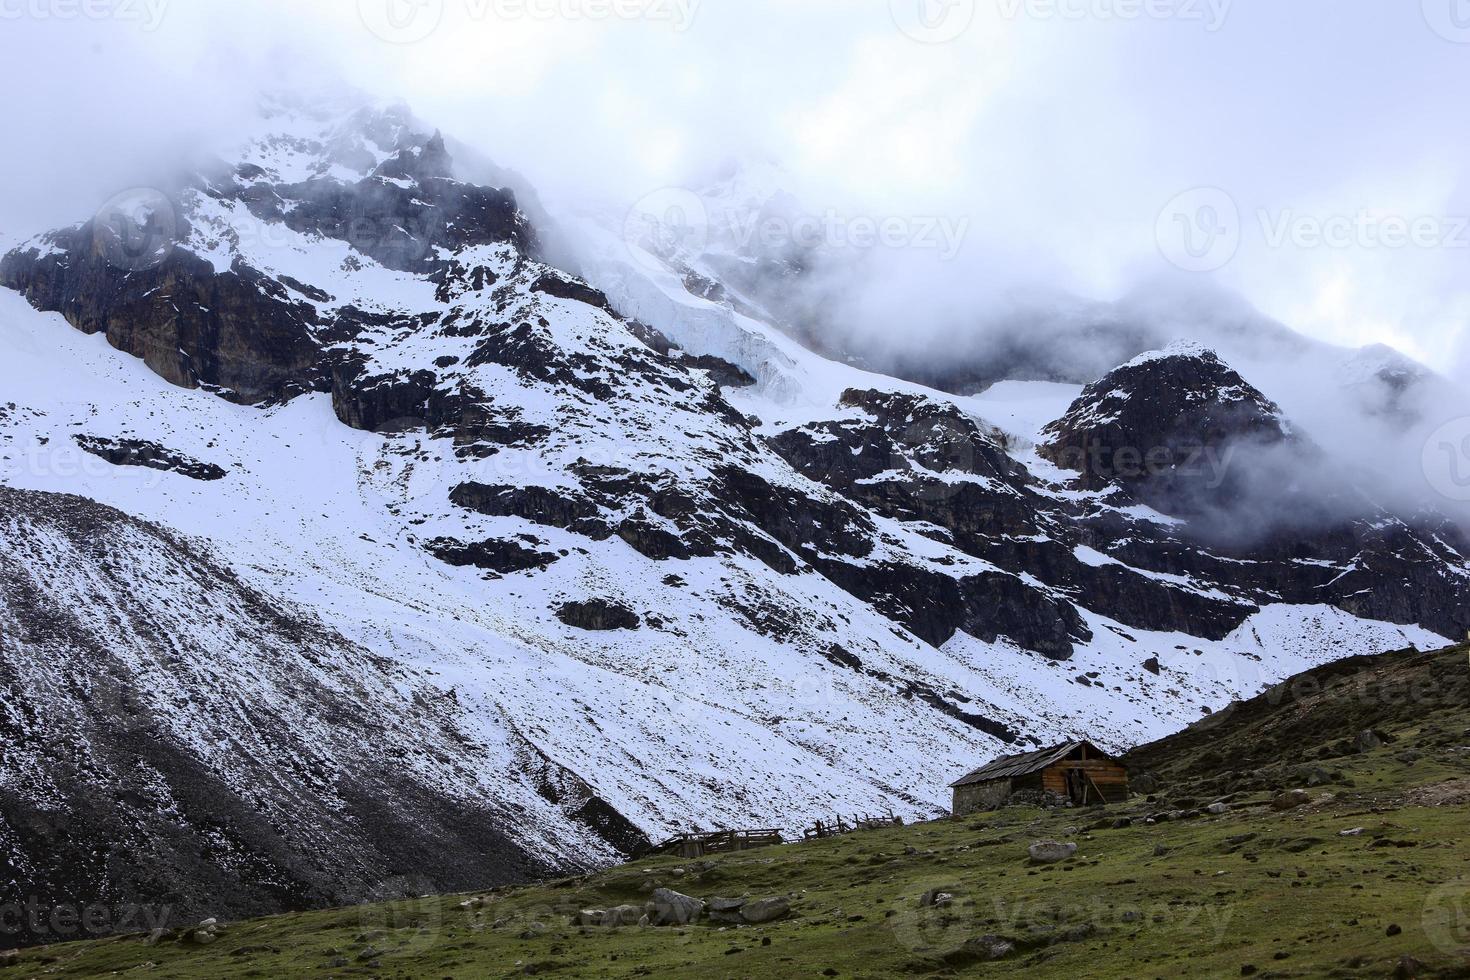 besneeuwde berg in mist-himalaya gebergte, sikkim, india foto